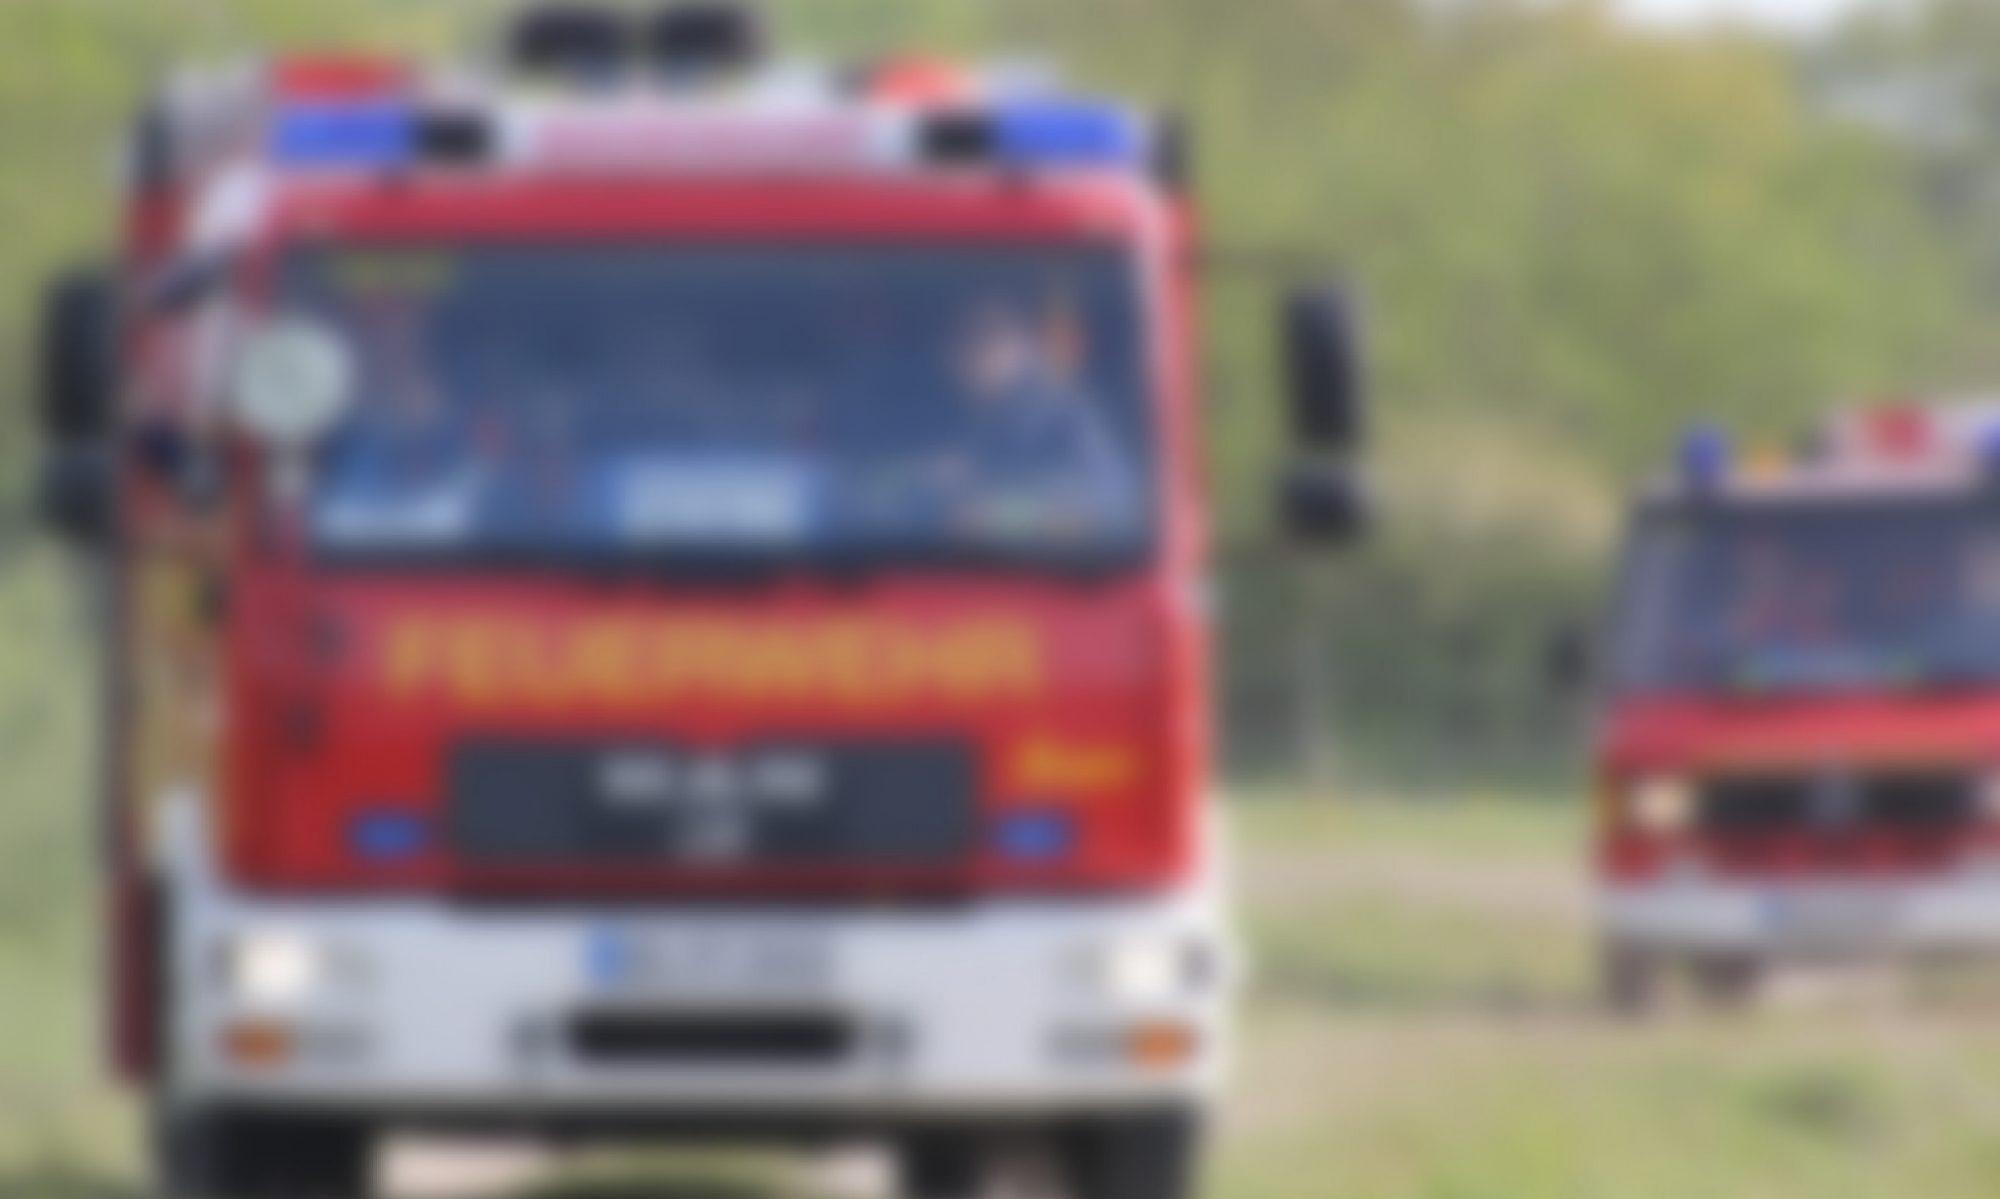 Feuerwehr Badendorf